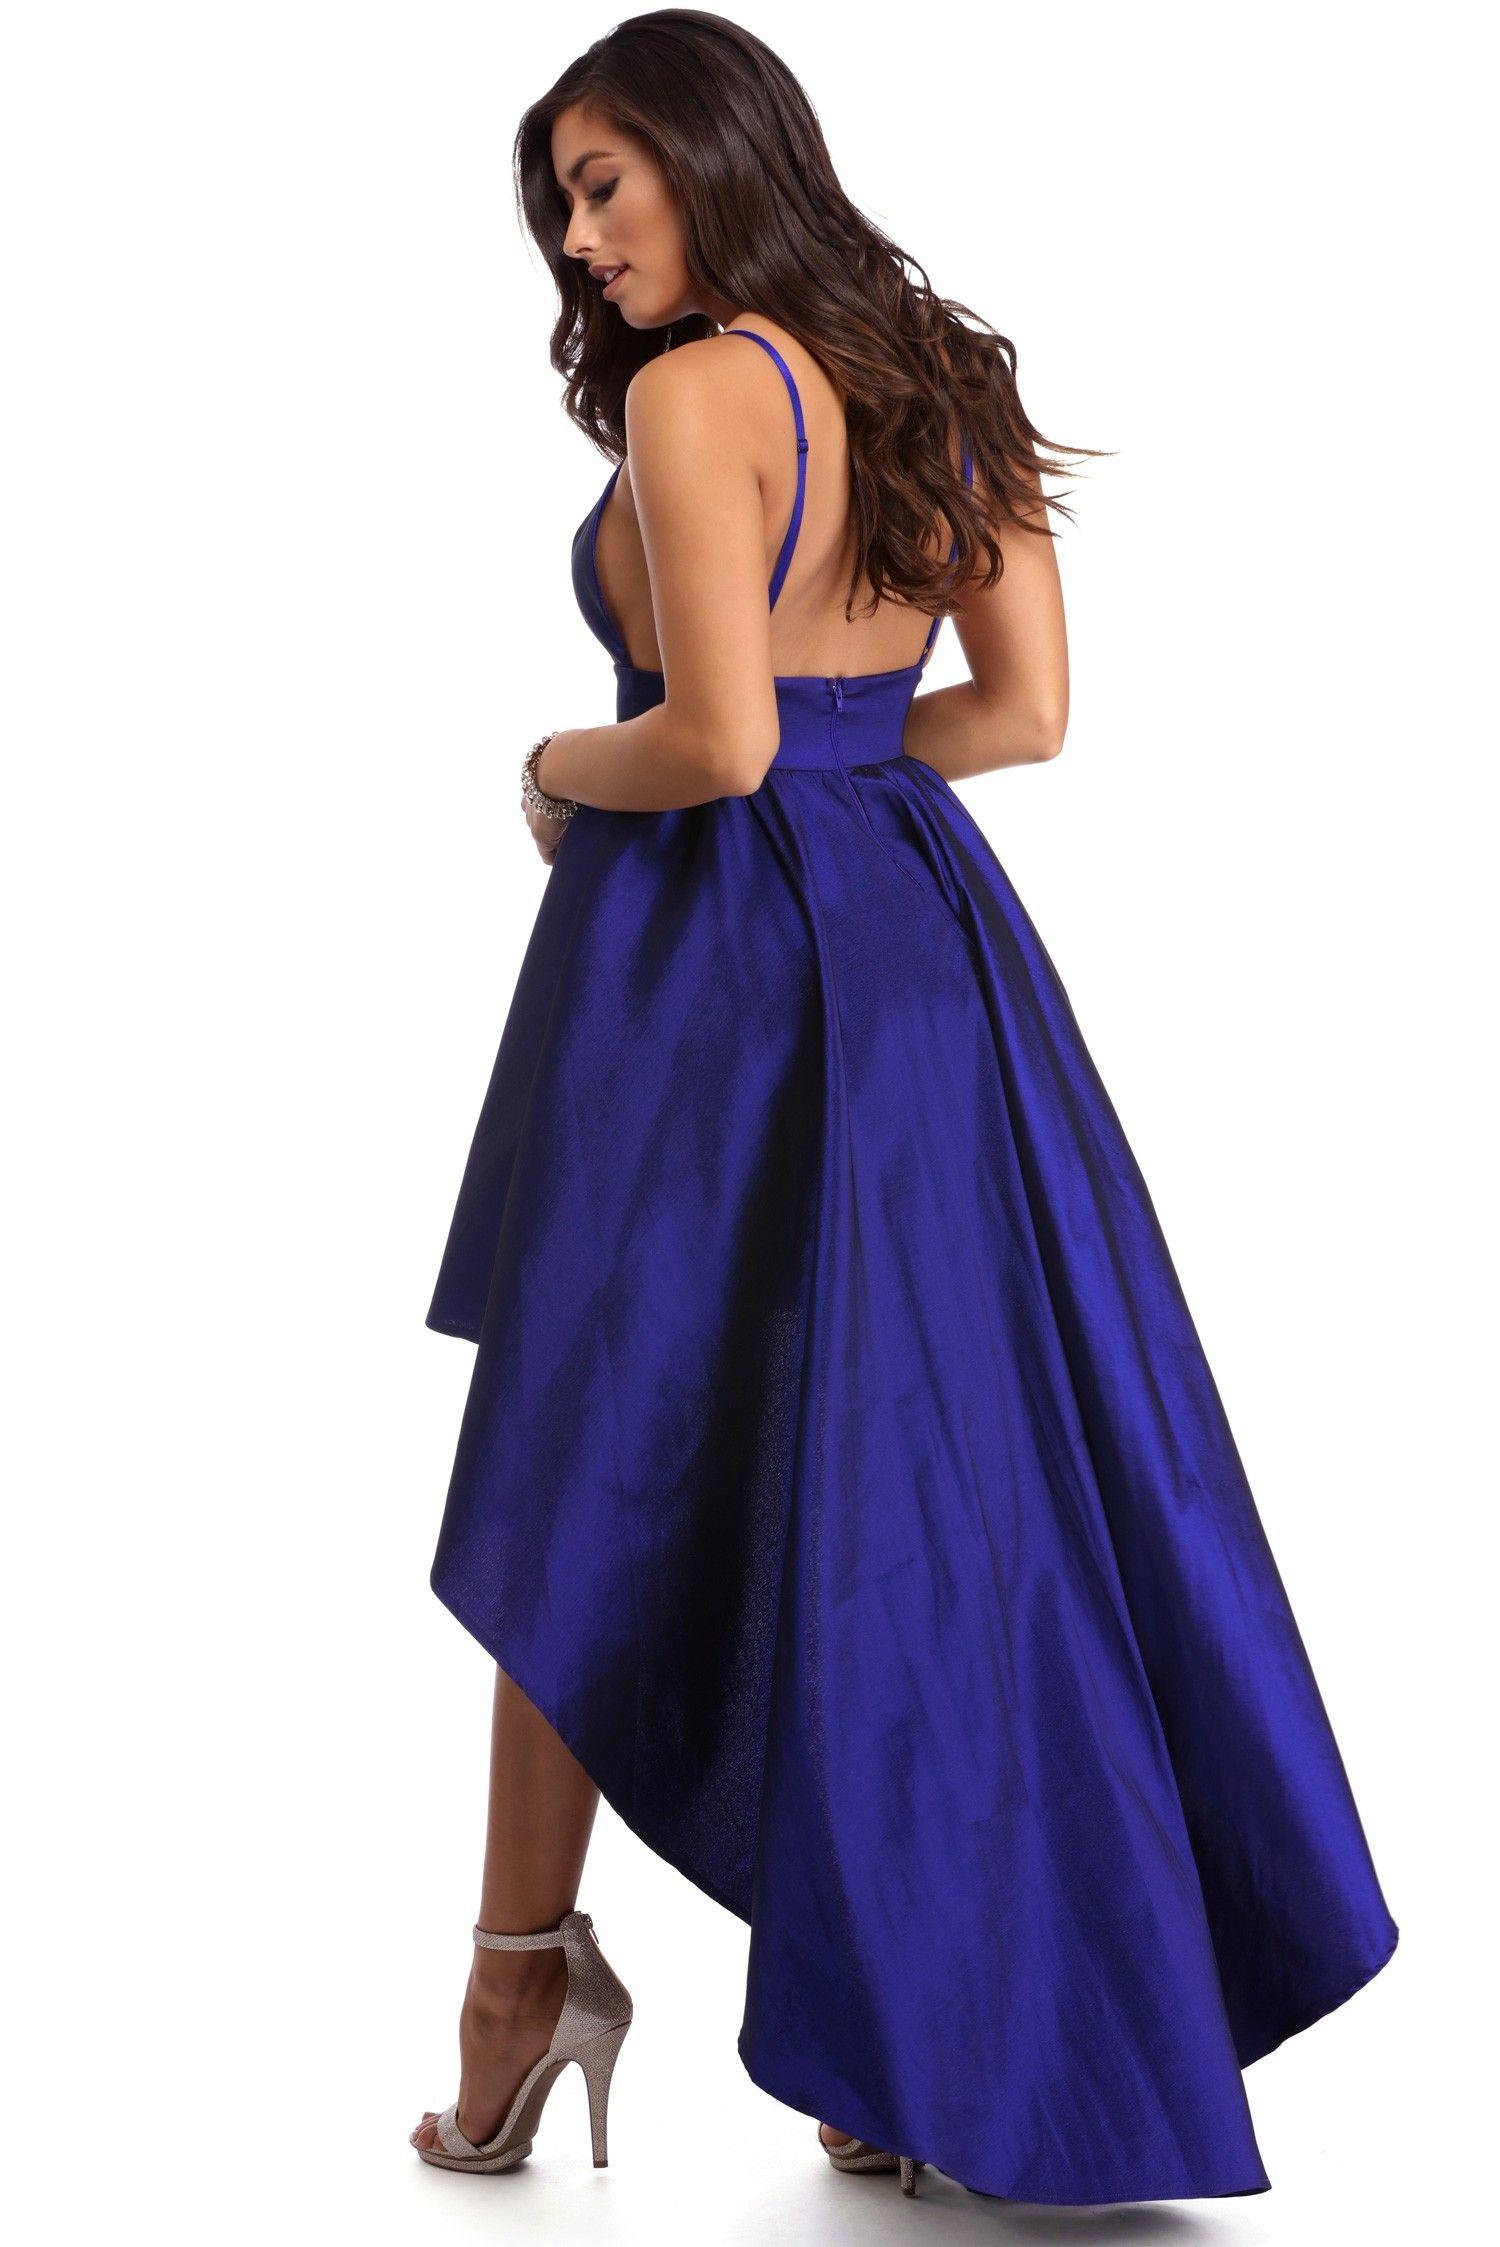 03fabe1d442 Lizbeth Navy Classic Twist Formal Dress